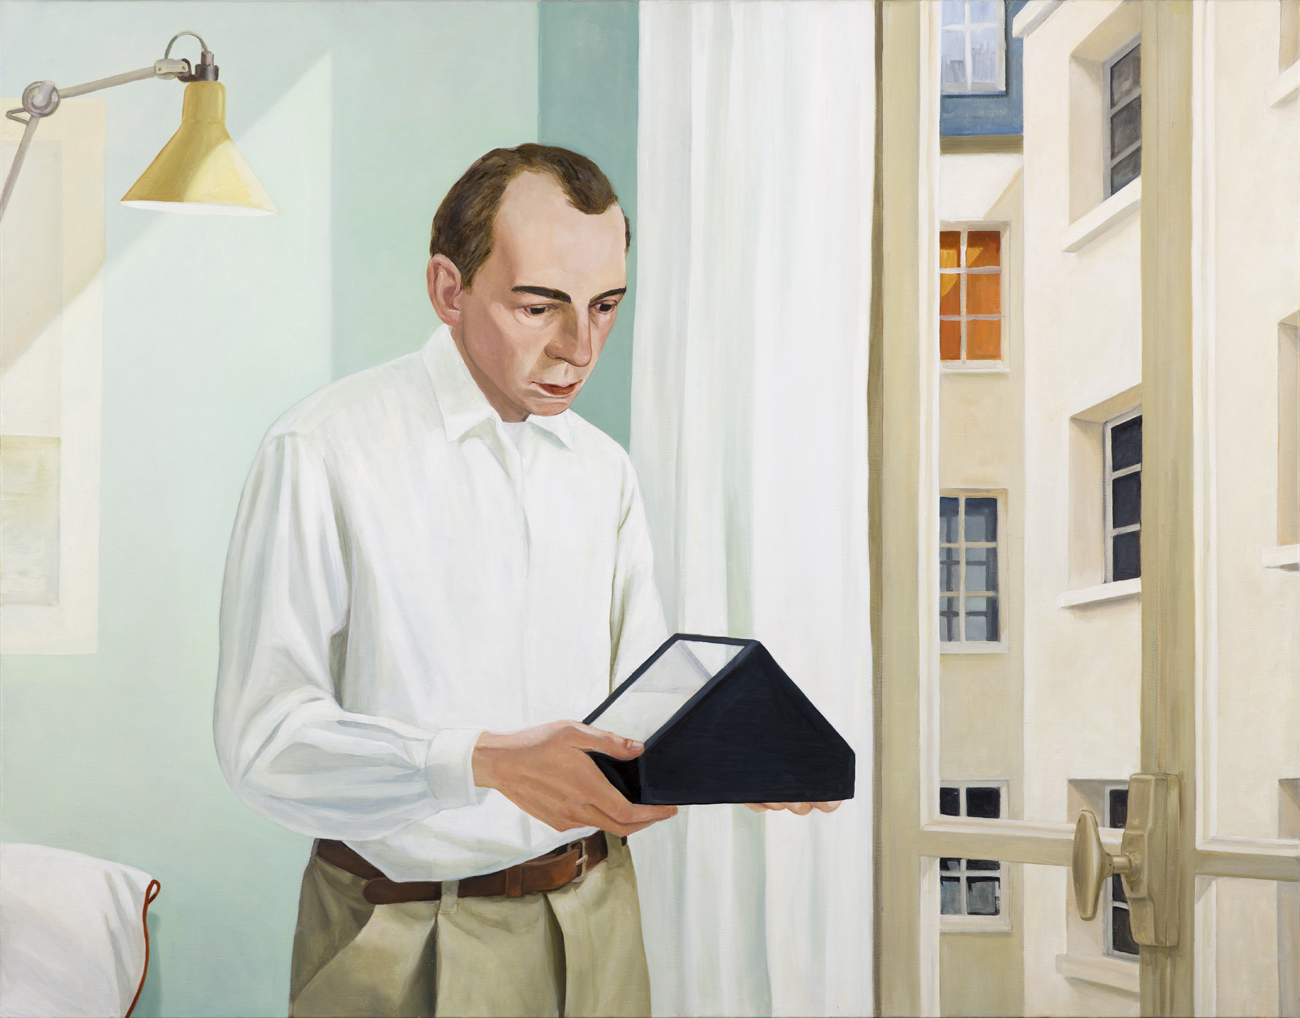 Lotta Hannertz  Artificial Horizon  2014 Oil on canvas 146 x 114 cm